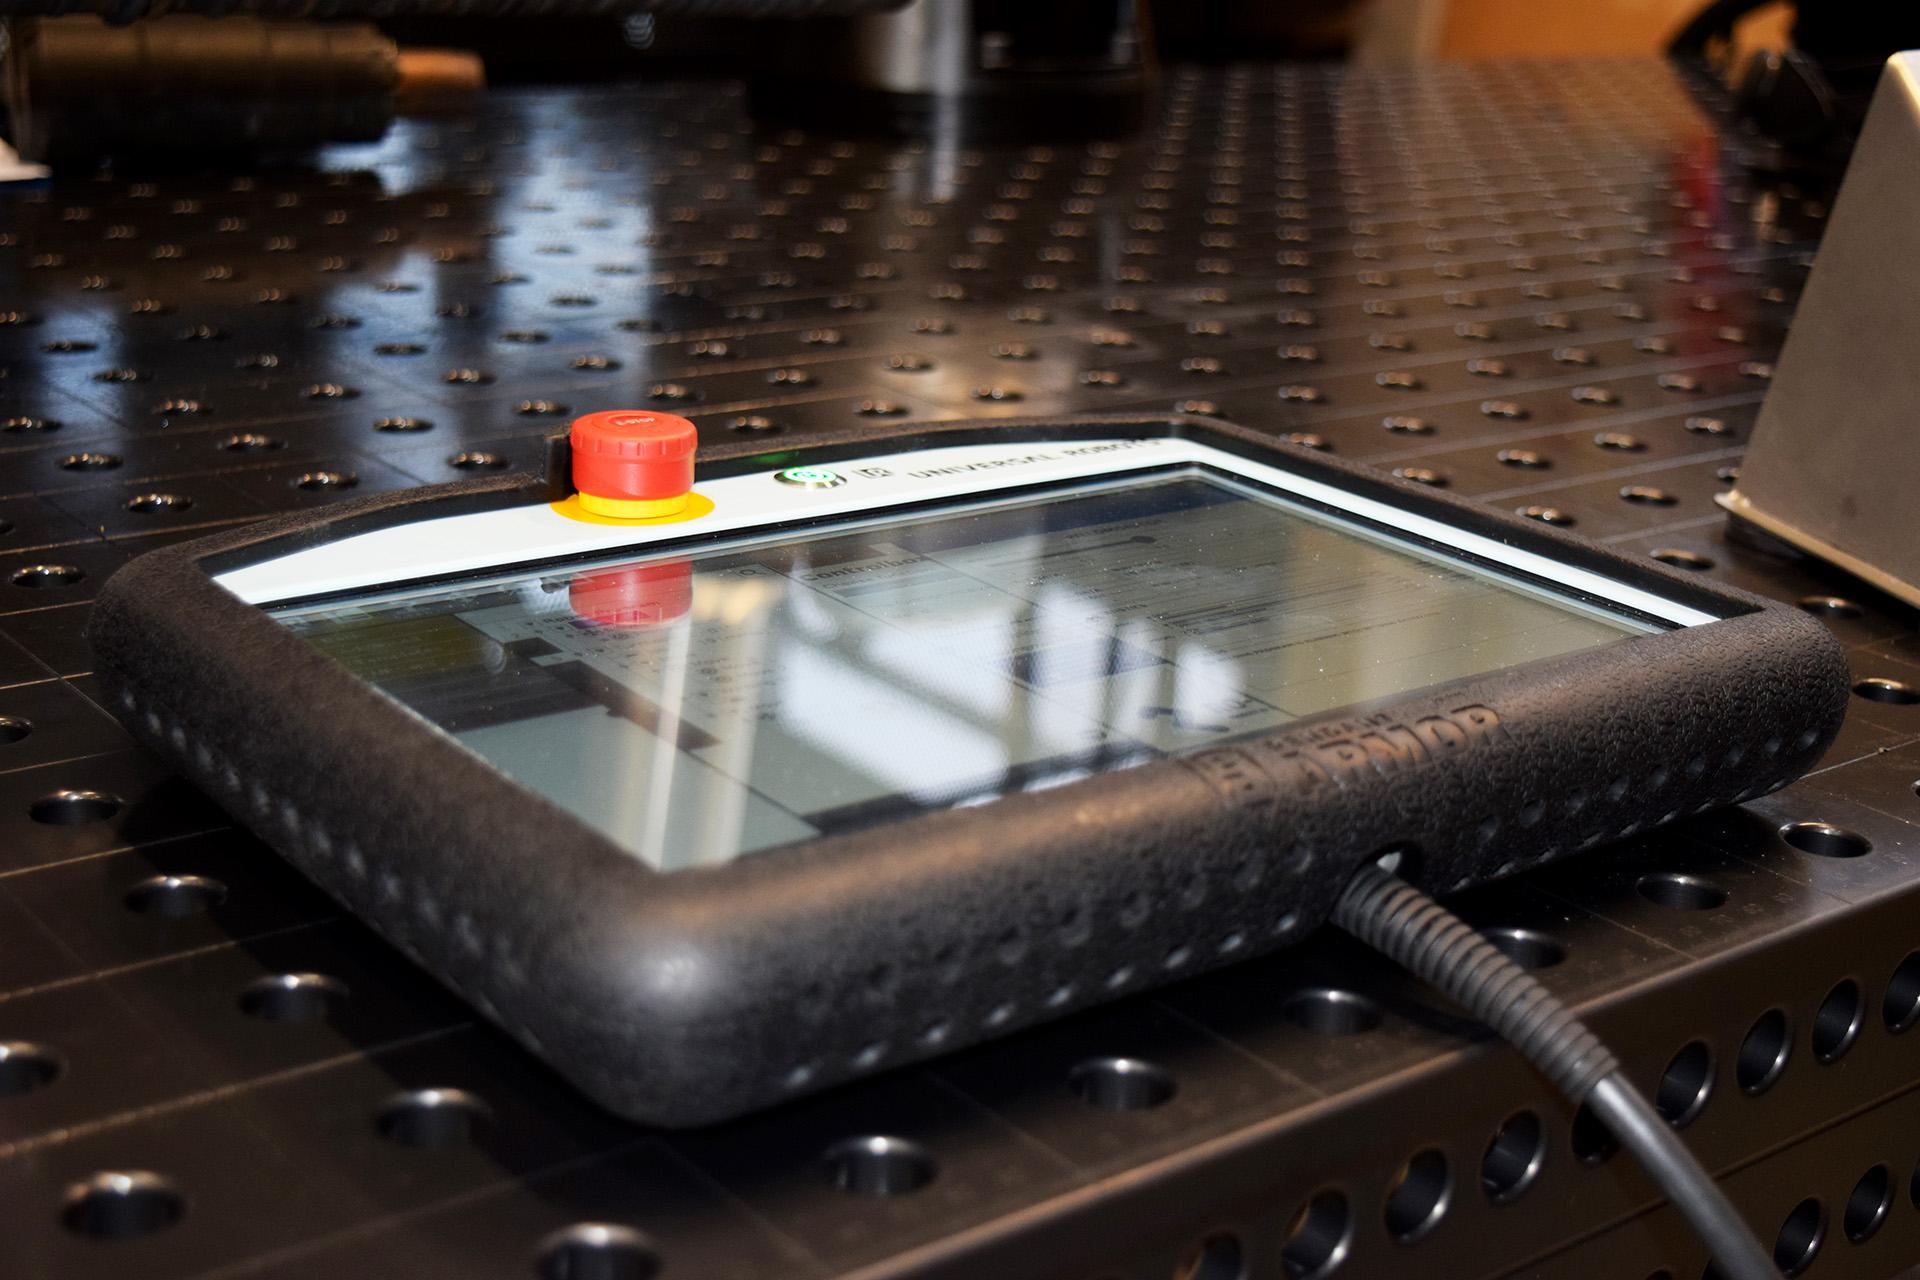 RBCobot URCap software på teach pendant med beskyttende cover fra toppen